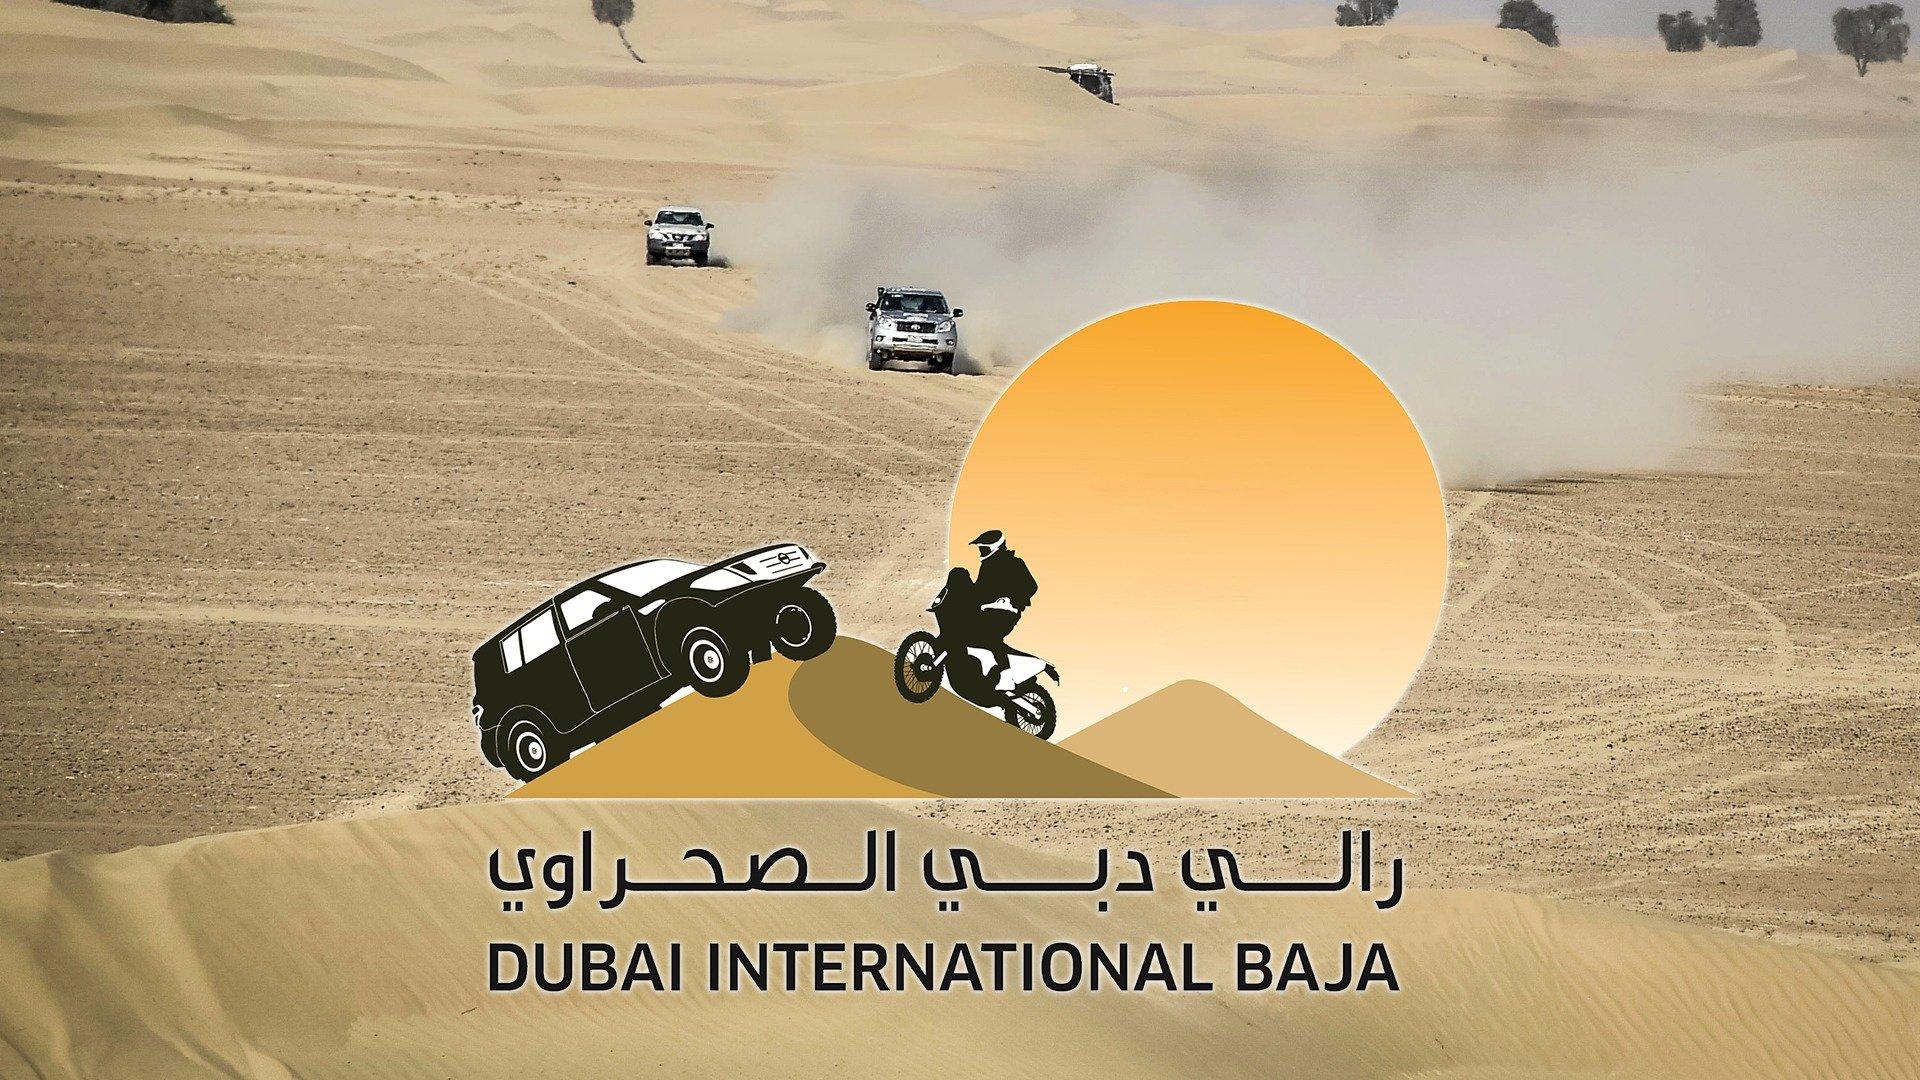 Dubai International Baja